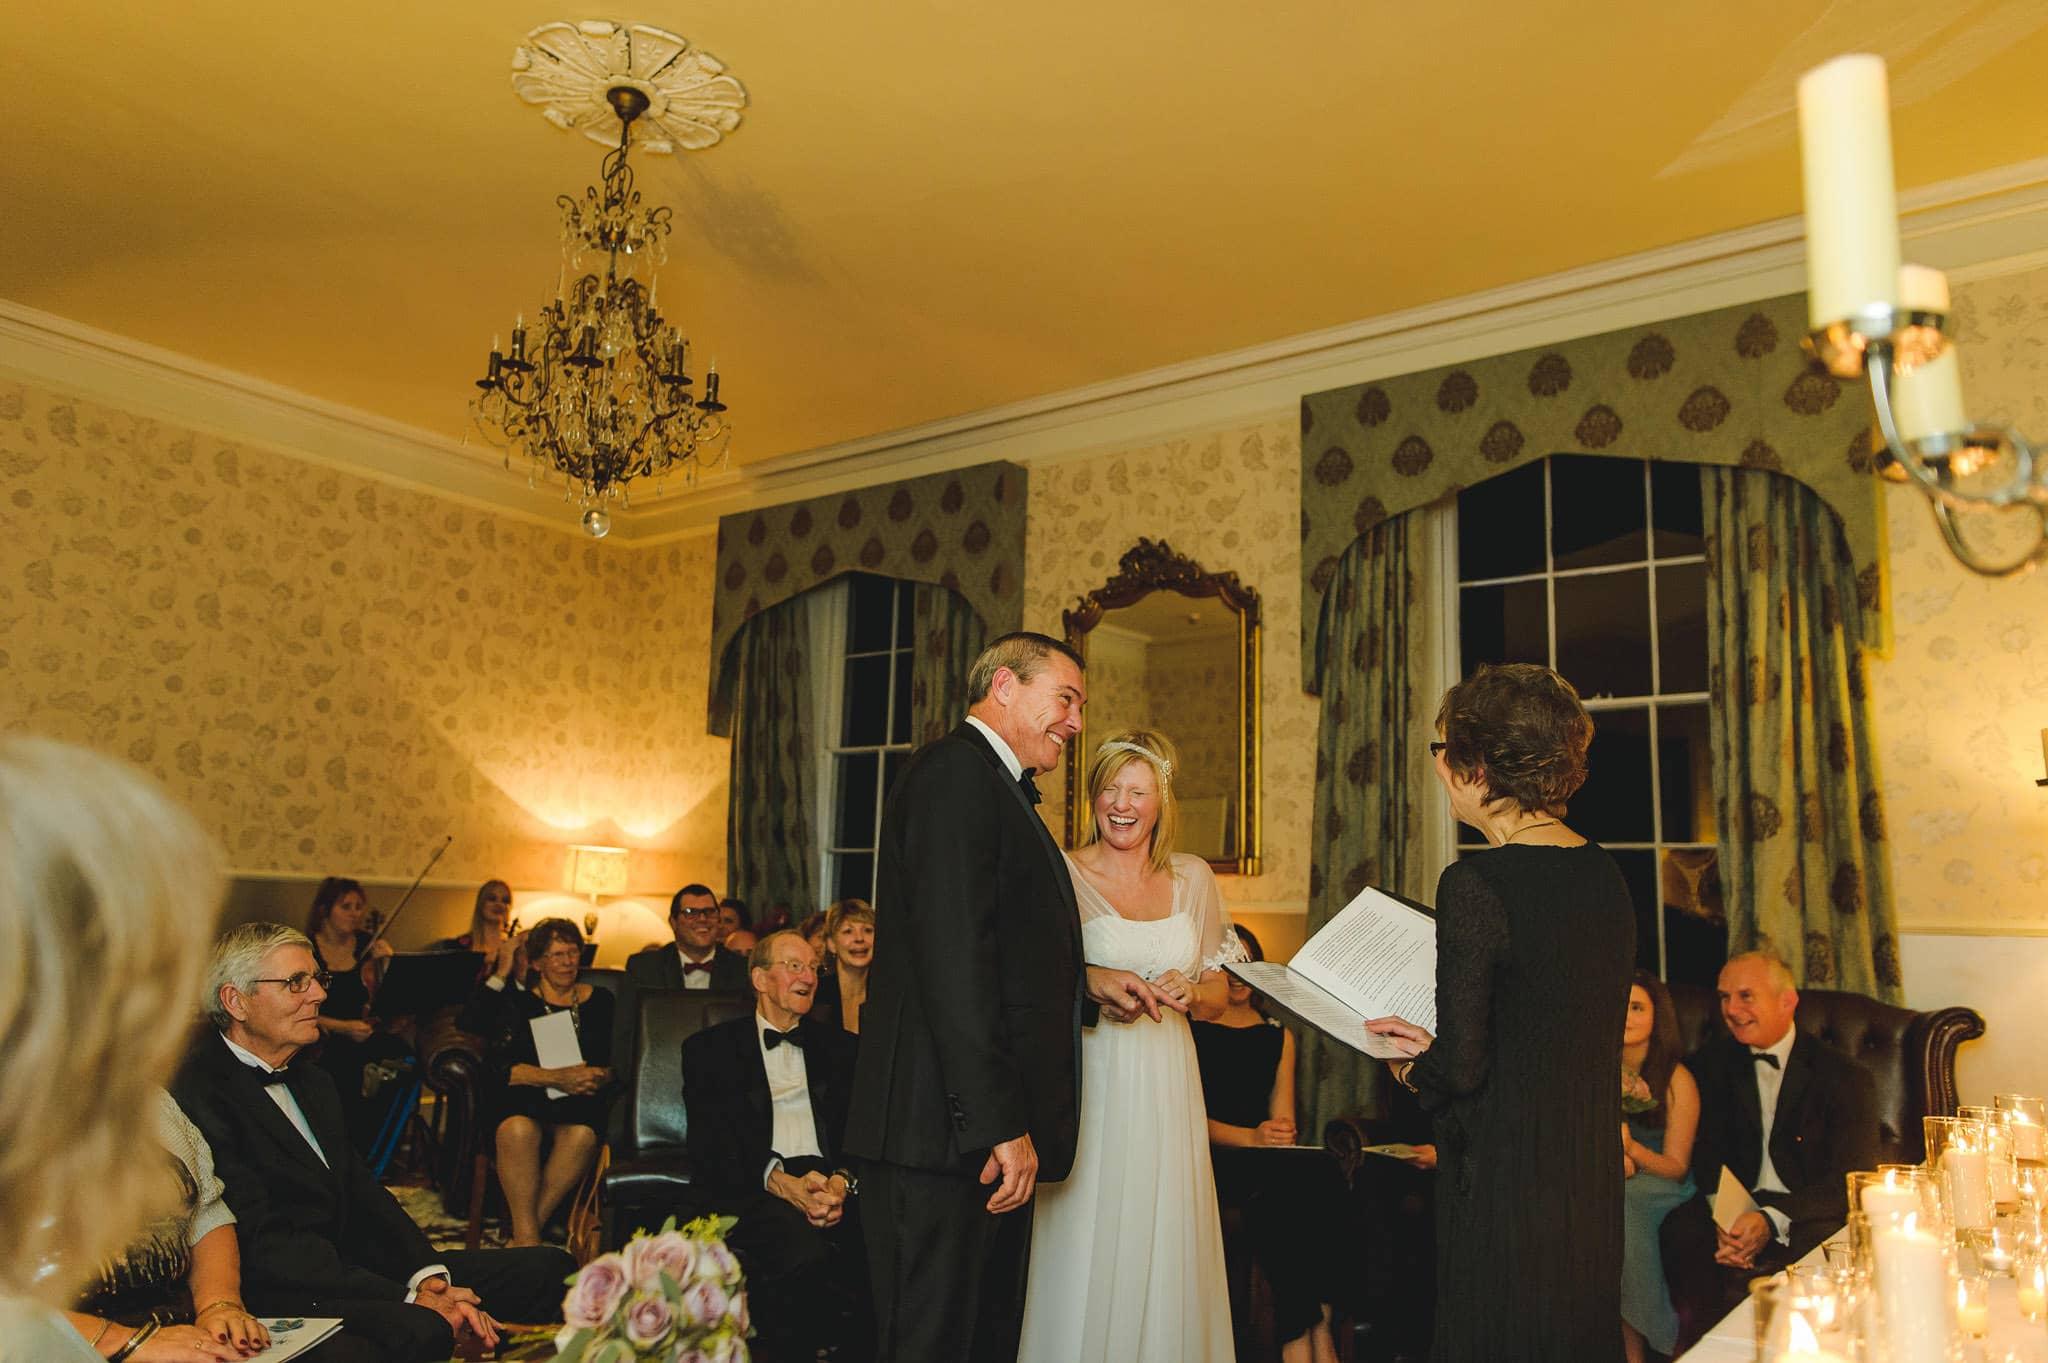 Wedding photography West Midlands | Claire + Stephen 31